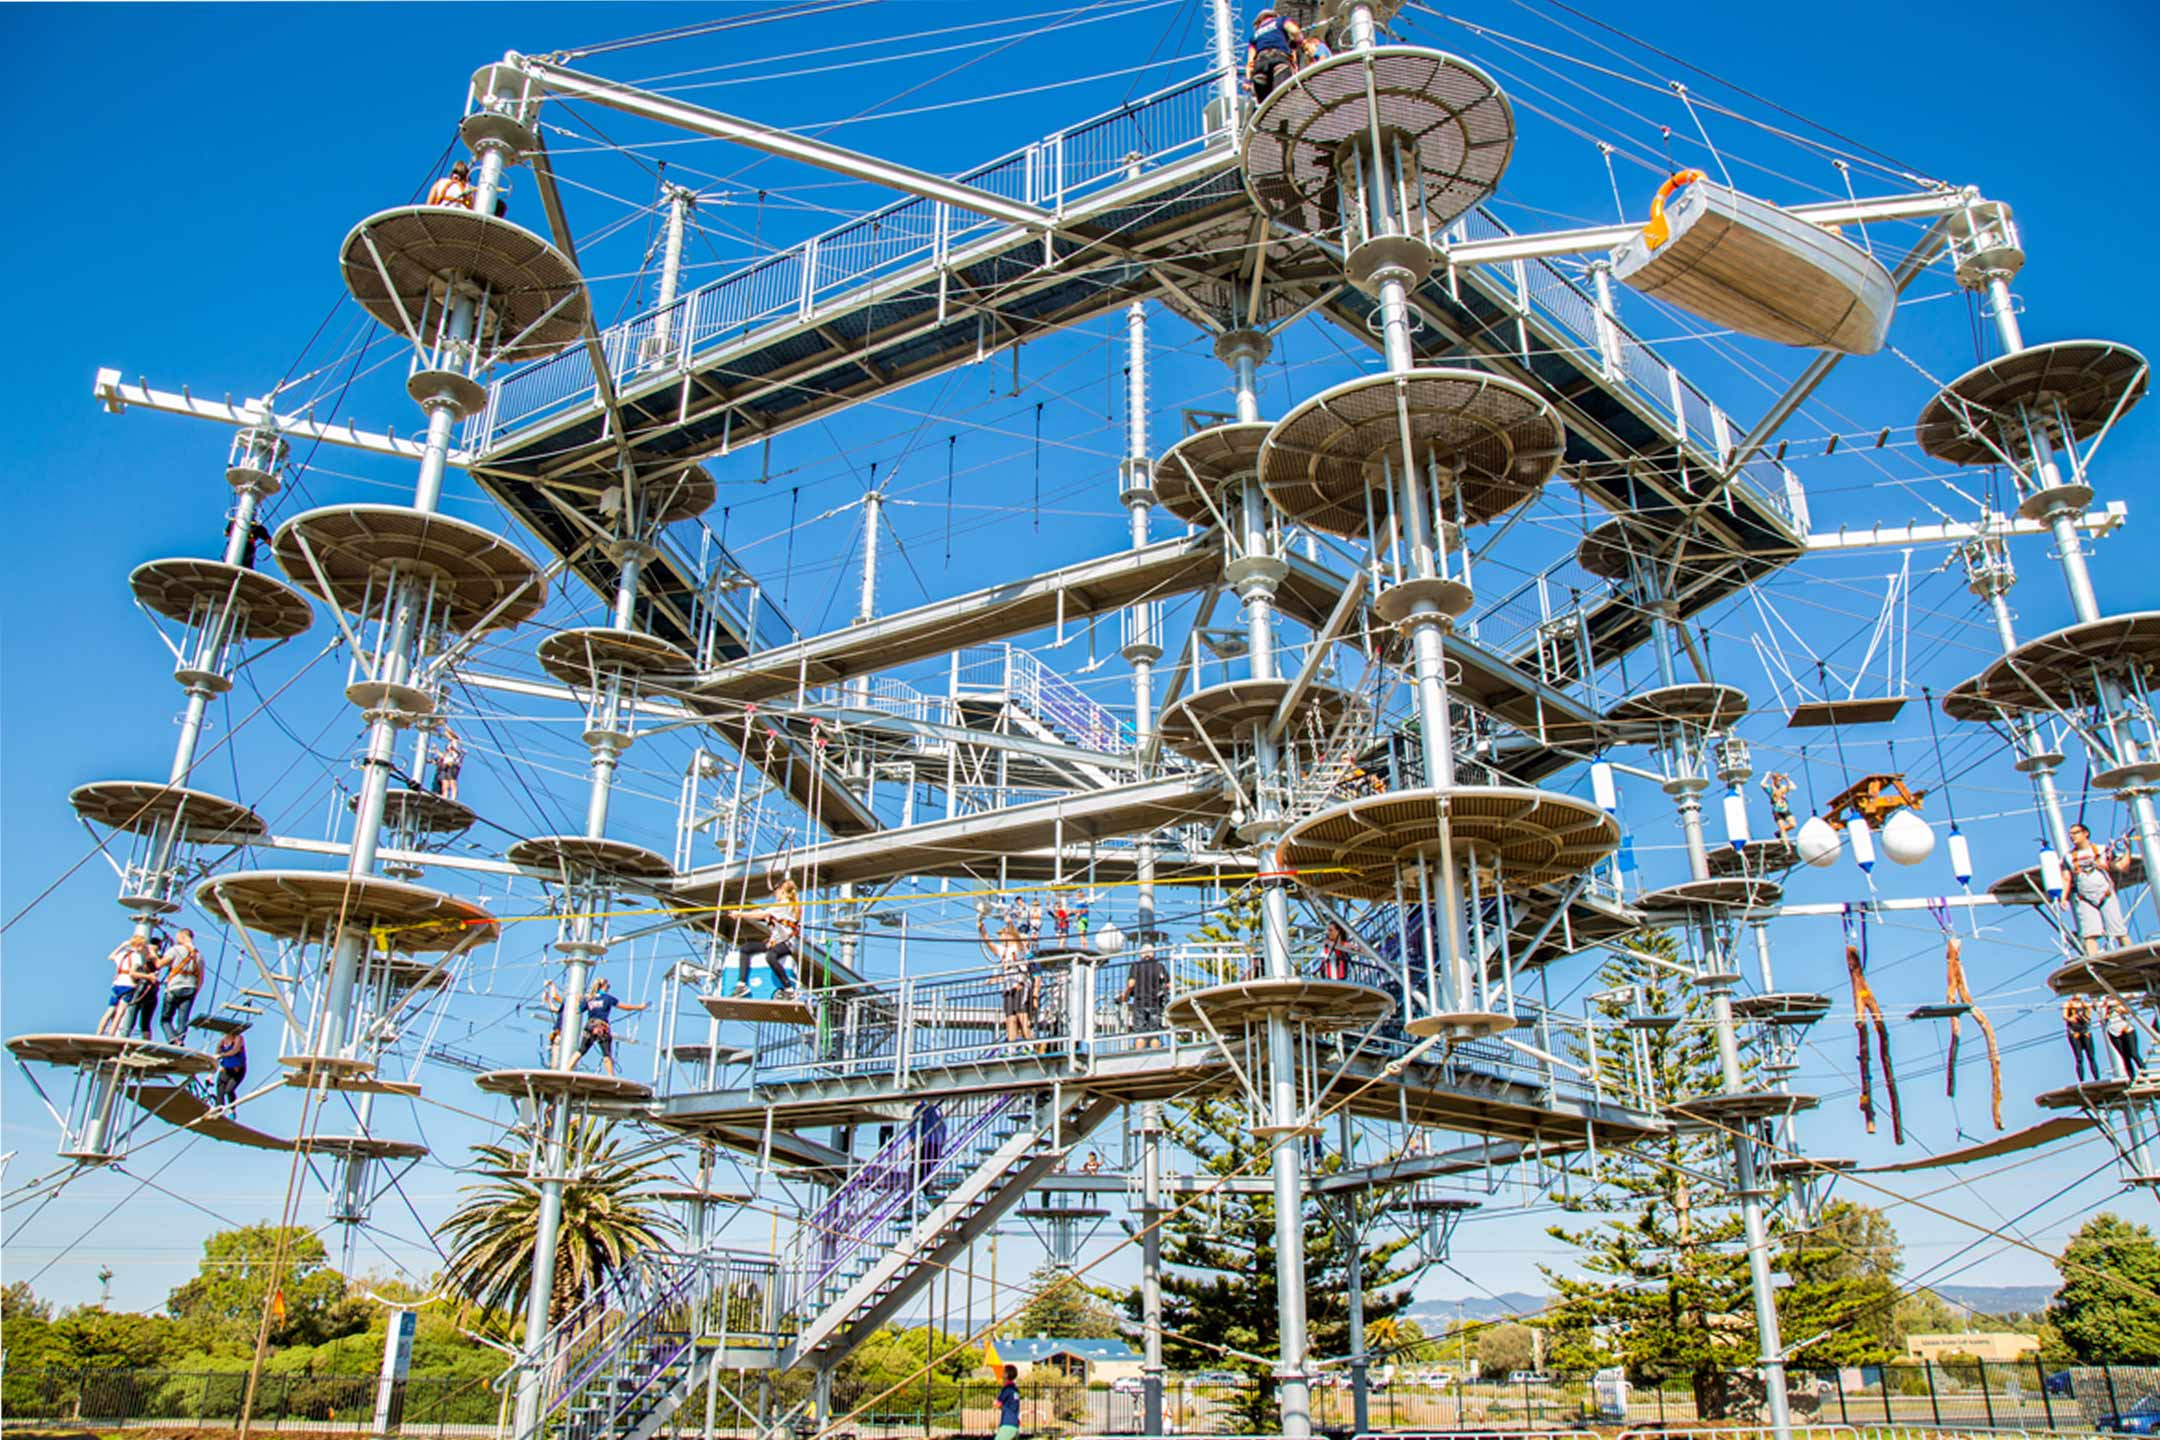 Sth-Aust-Mega-Adventure-Park2160